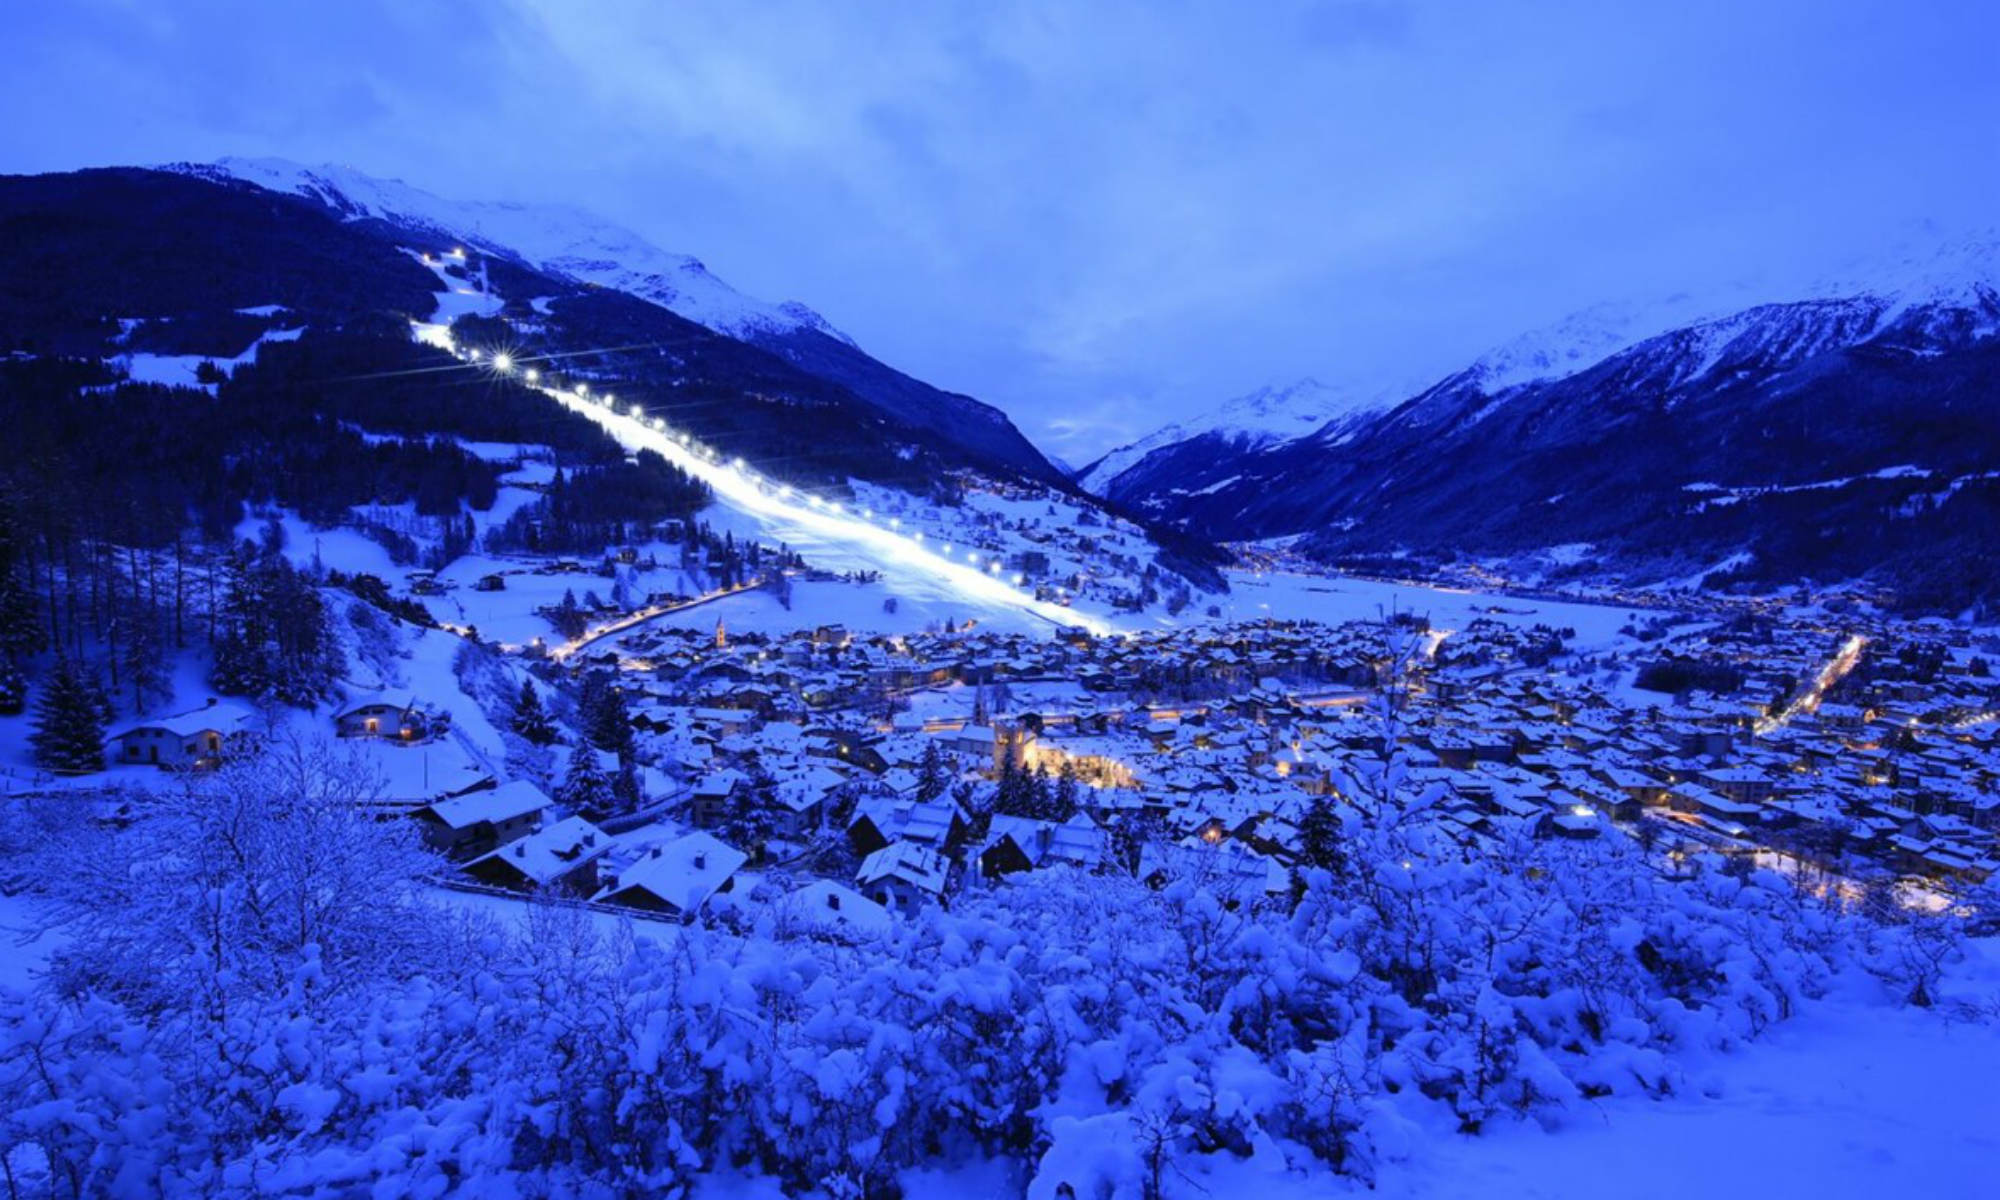 Montagne imbiancate e case illuminate, il panorama bellissimo di Bormio.